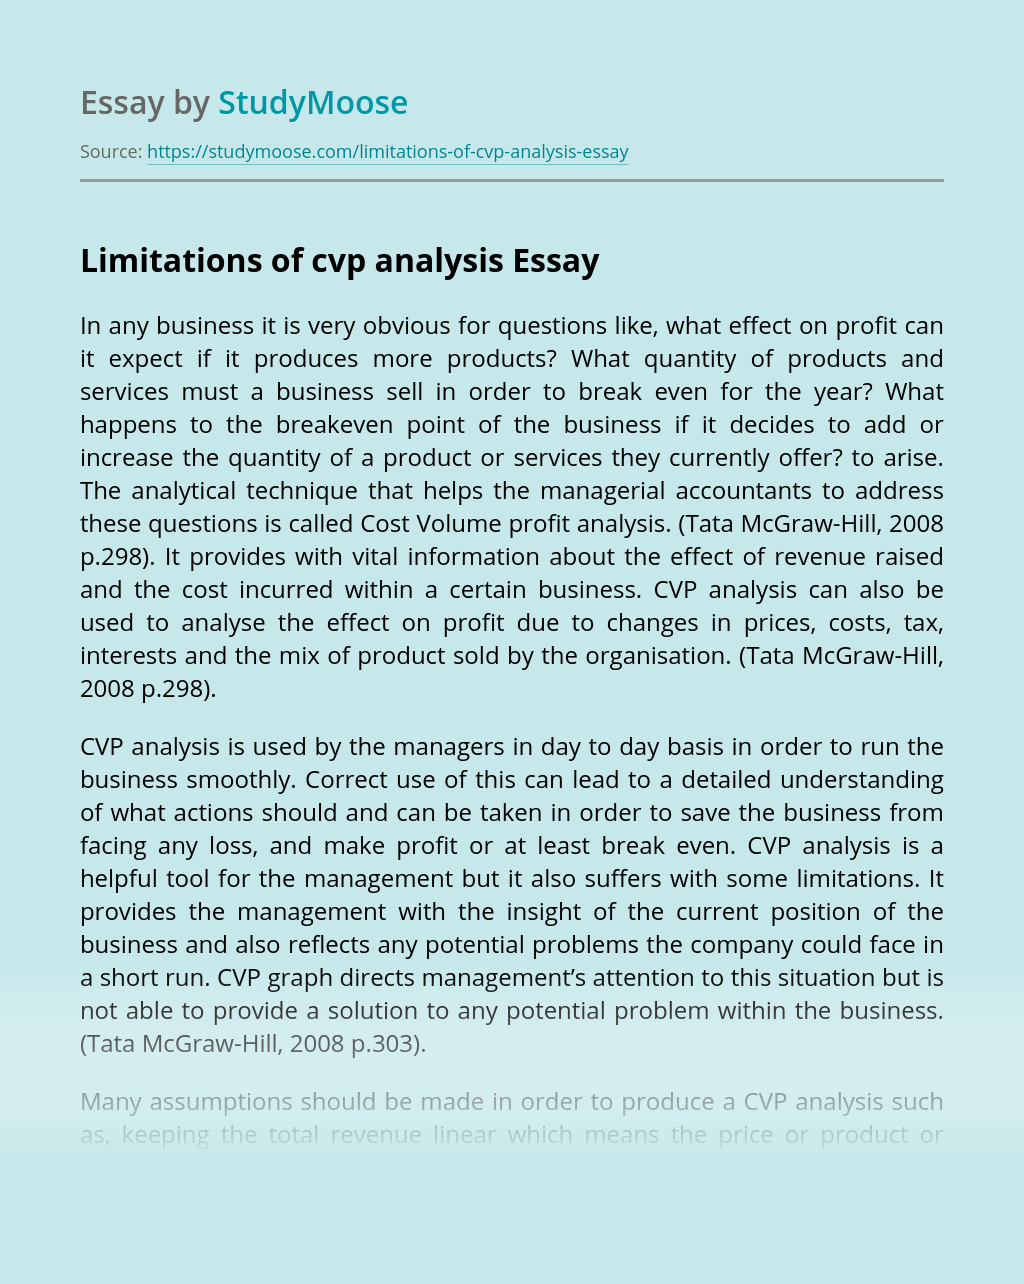 Limitations of cvp analysis